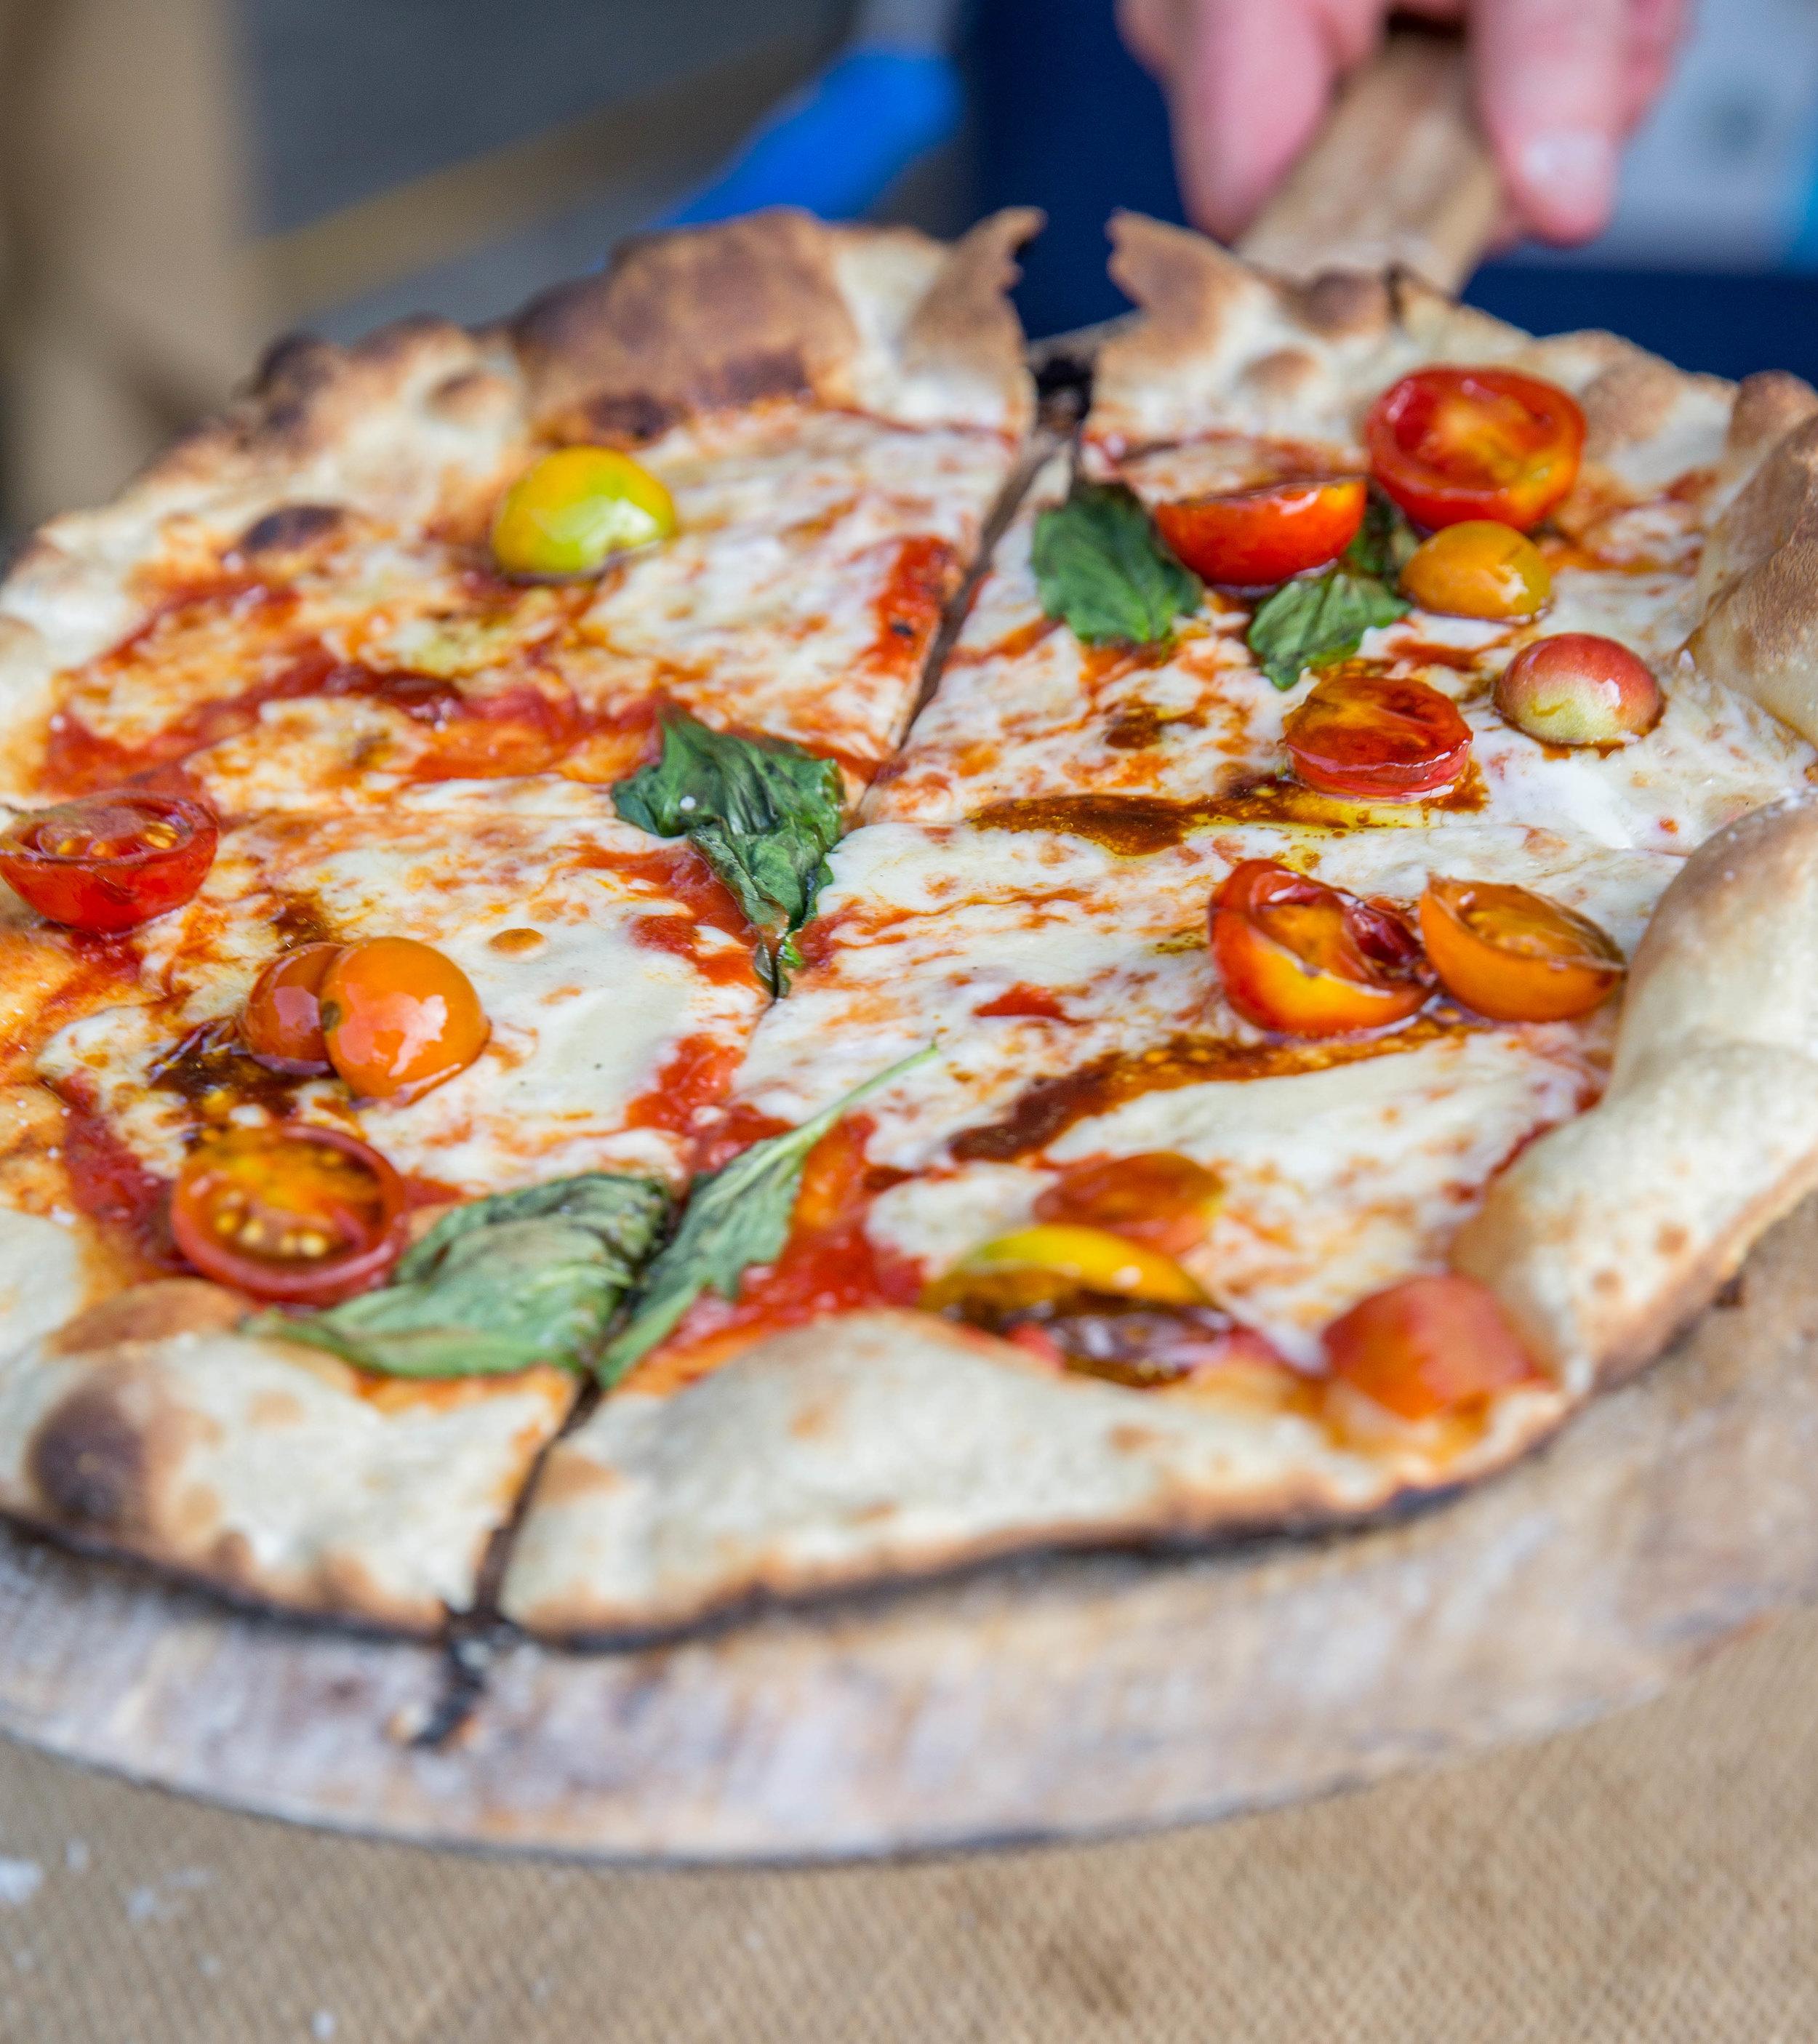 Coronato_Pizza_Pop_Up-84.jpg